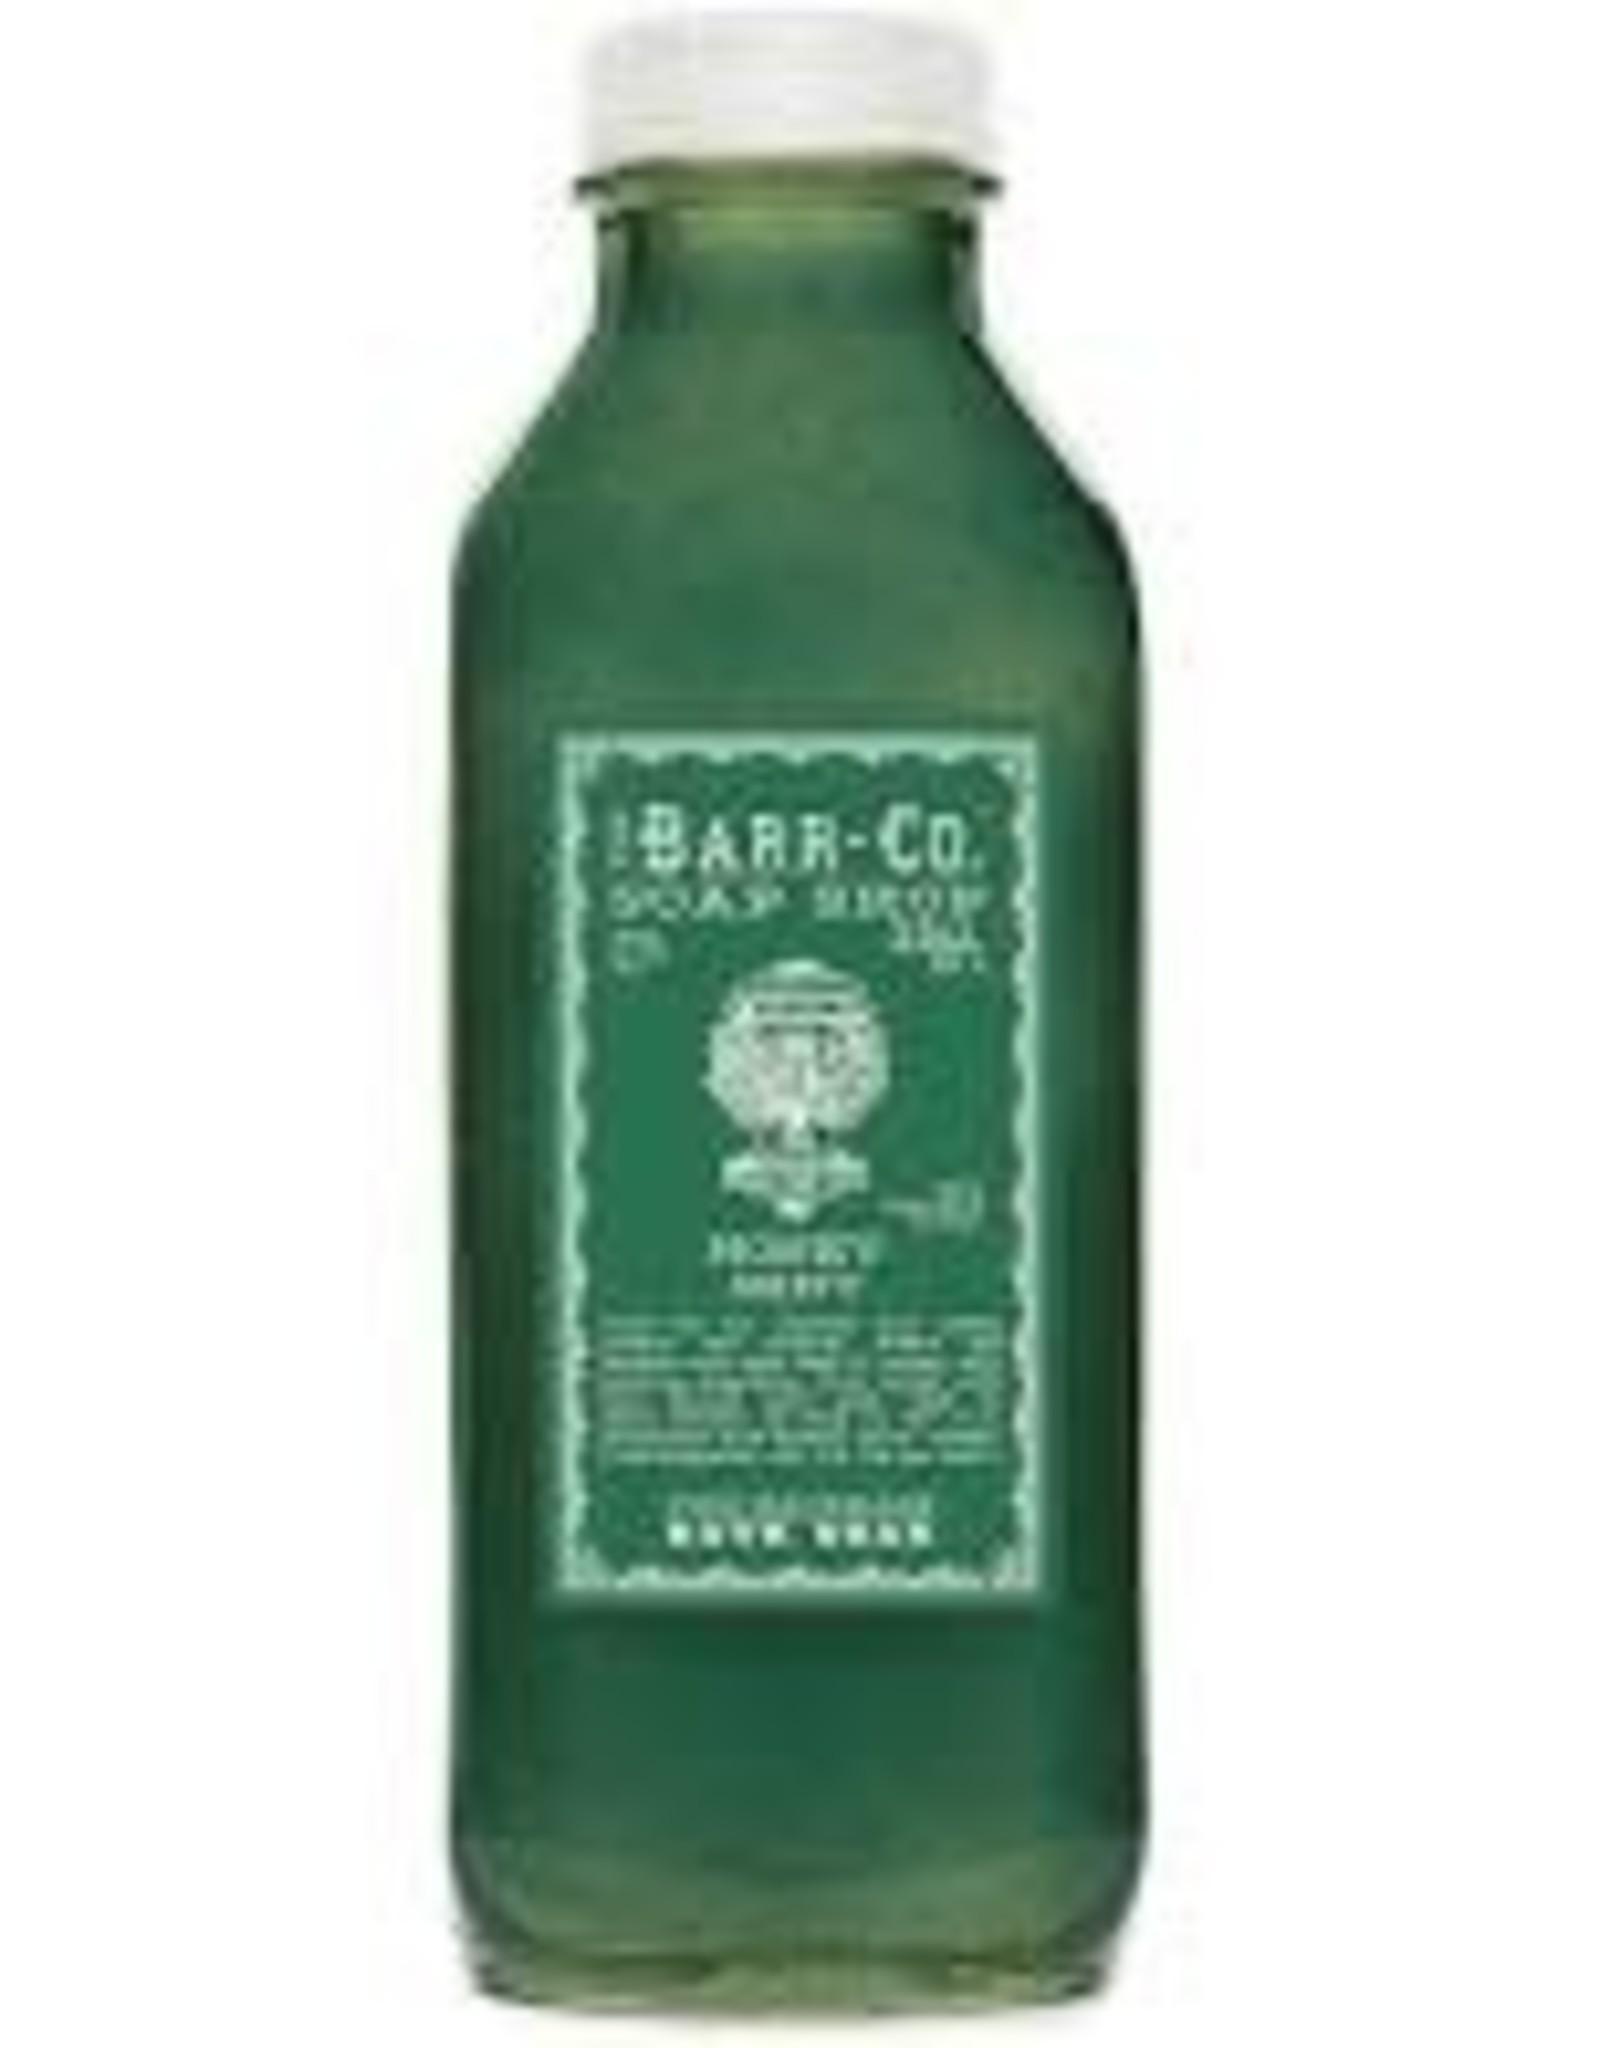 Barr-Co. Barr-Co. Bath Soak 32oz Honey Mint